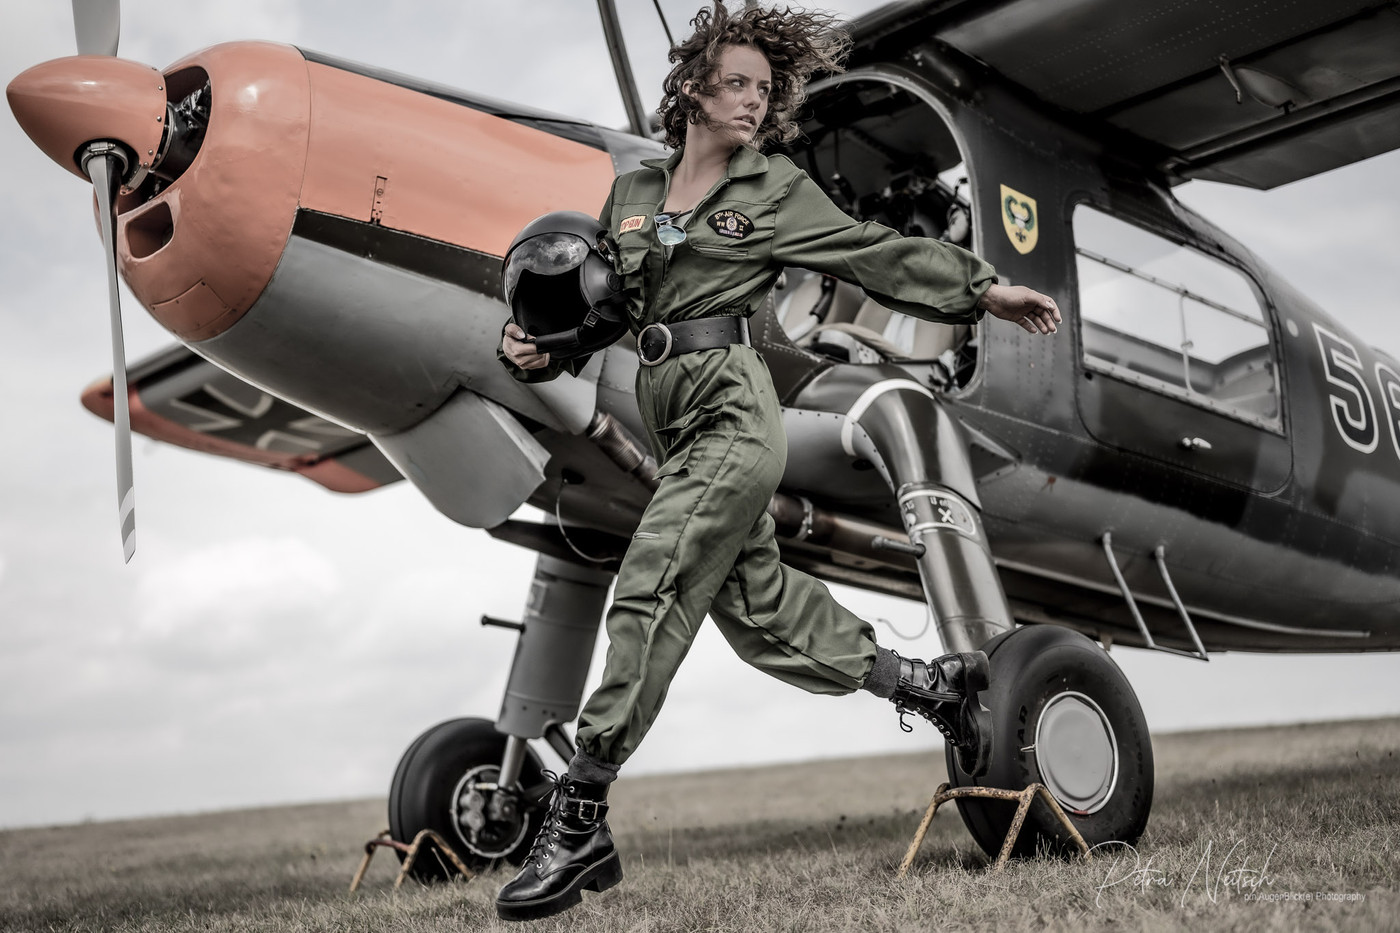 09-2019-Planes Girls and Rockn Roll-26.j